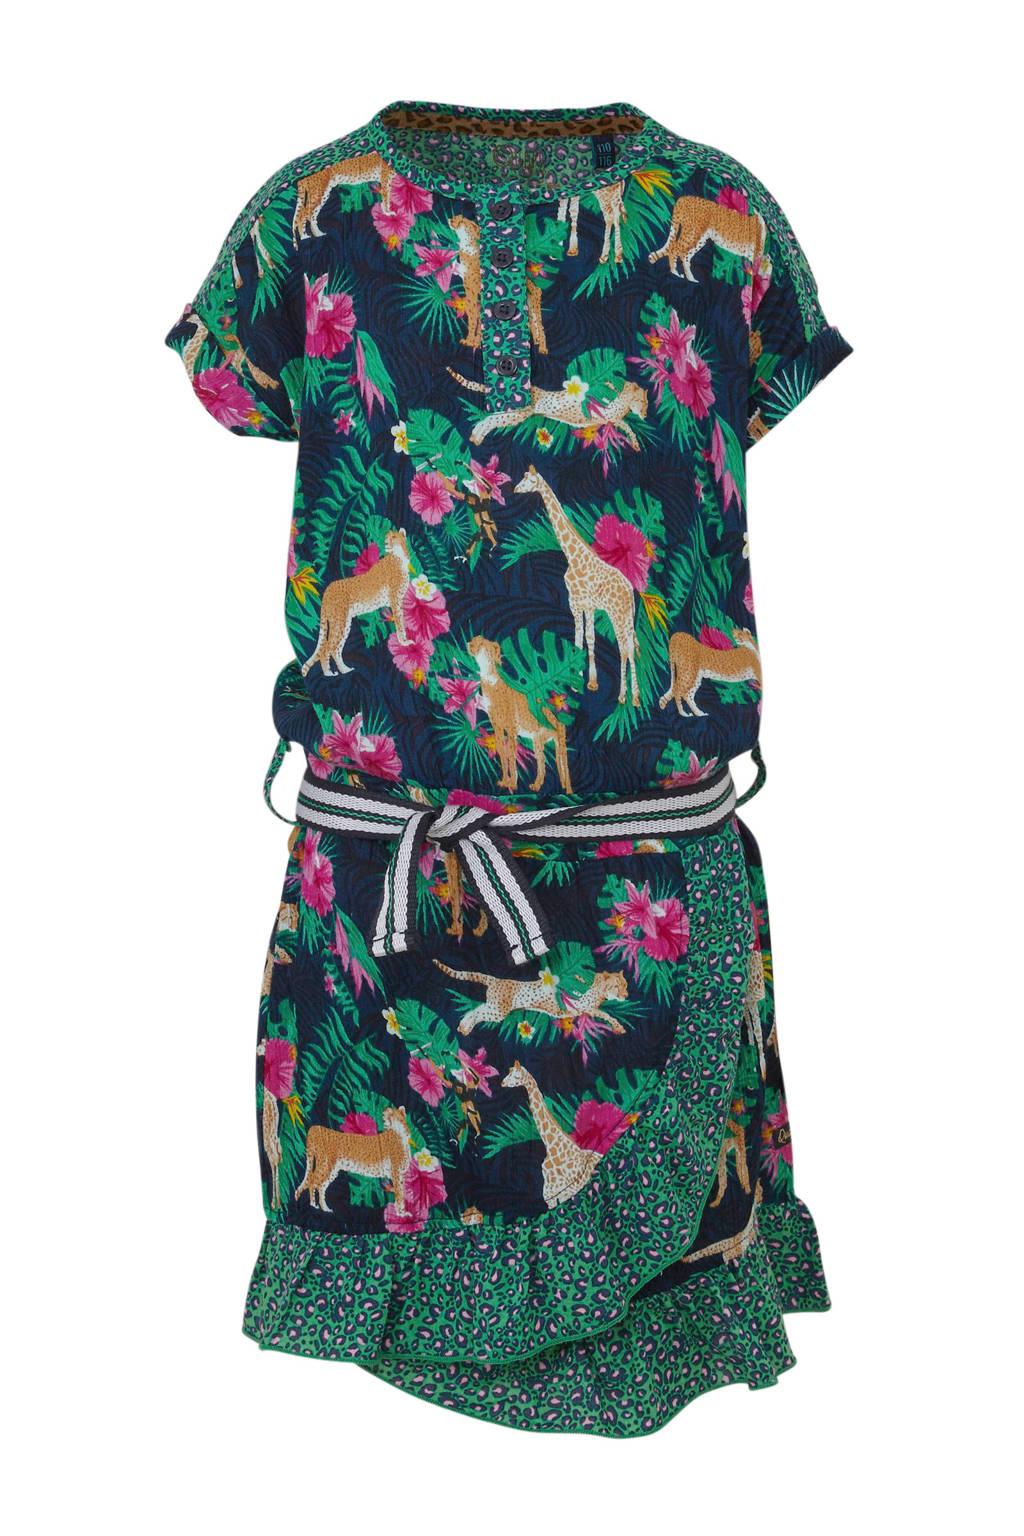 Quapi jurk Acey met all over print en volant groen/donkerblauw/fuchsia, Groen/donkerblauw/fuchsia